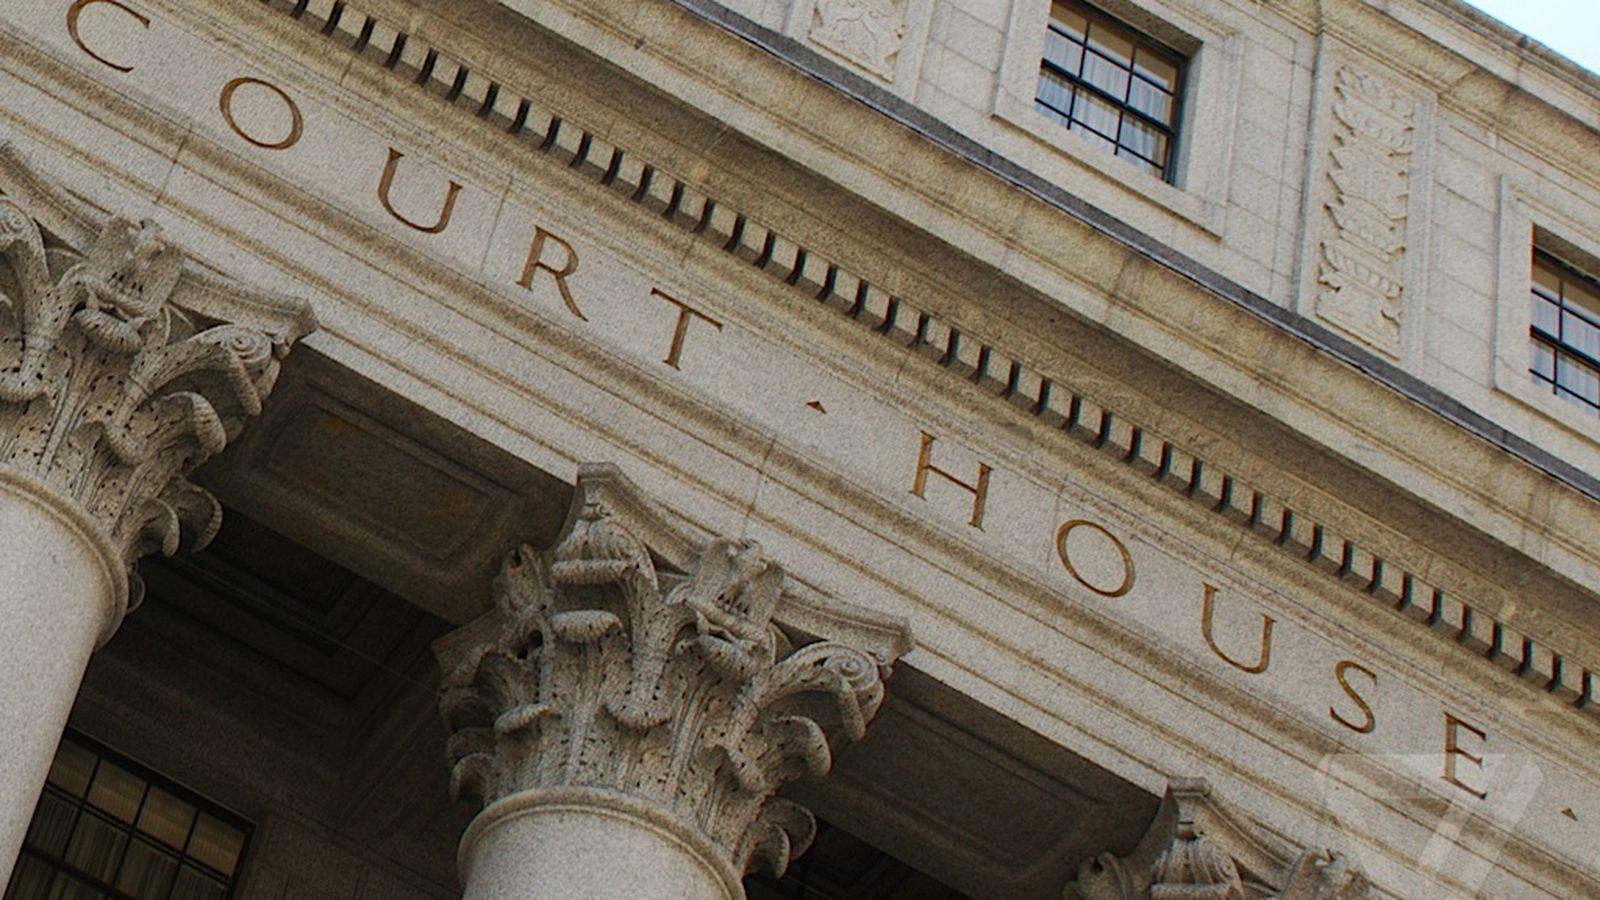 elder justice act essay sample